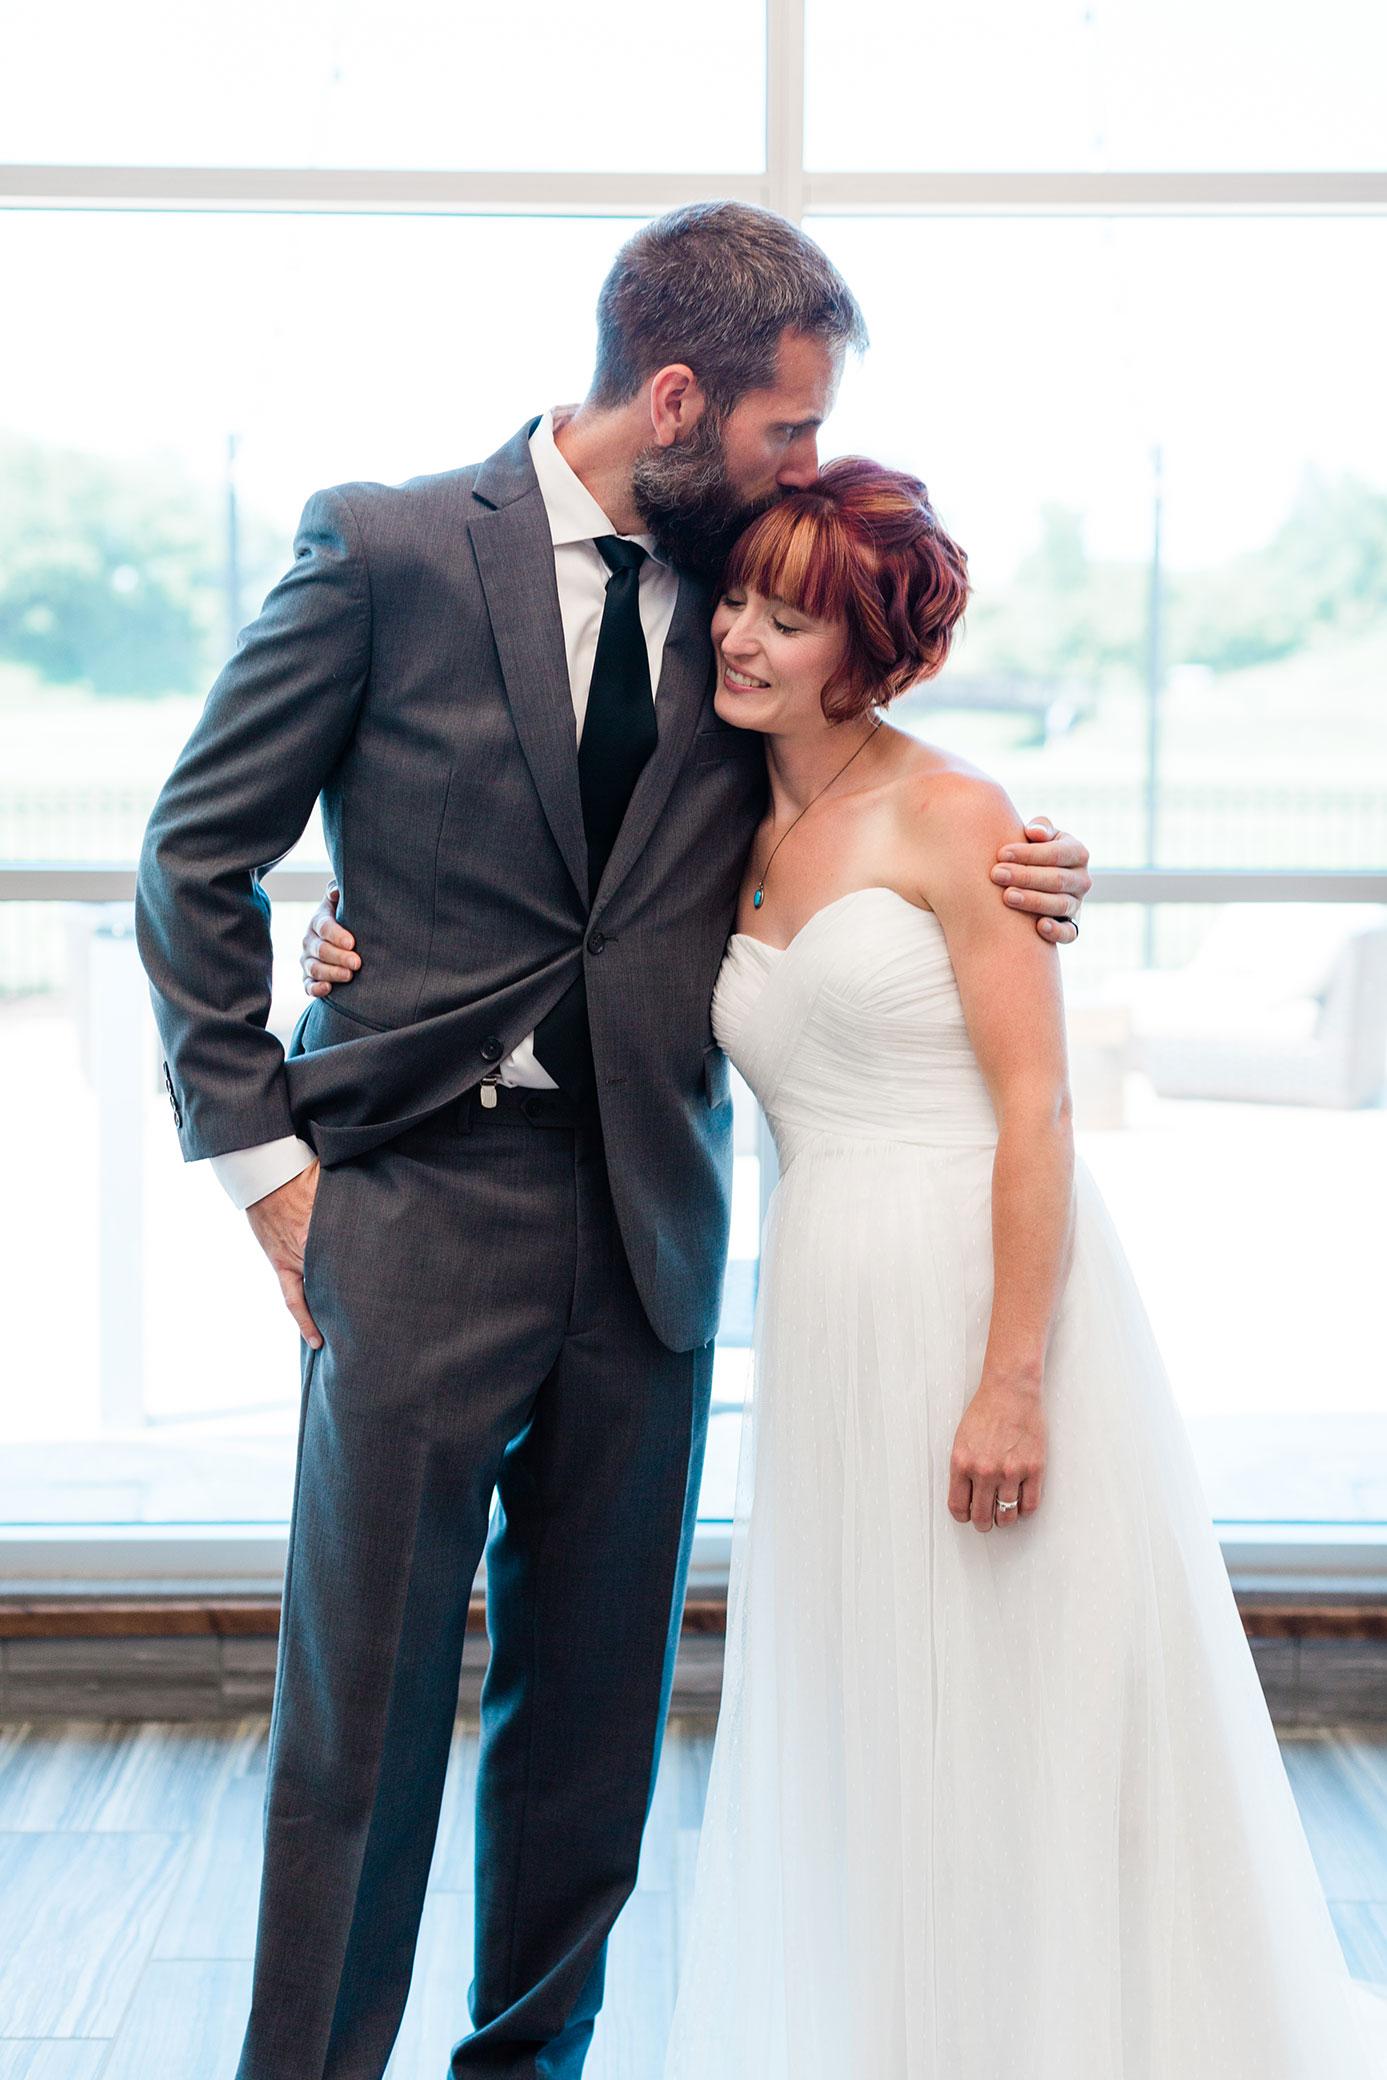 Beardmore_Center_Bellevue_Wedding_Laura_Dave-245.jpg